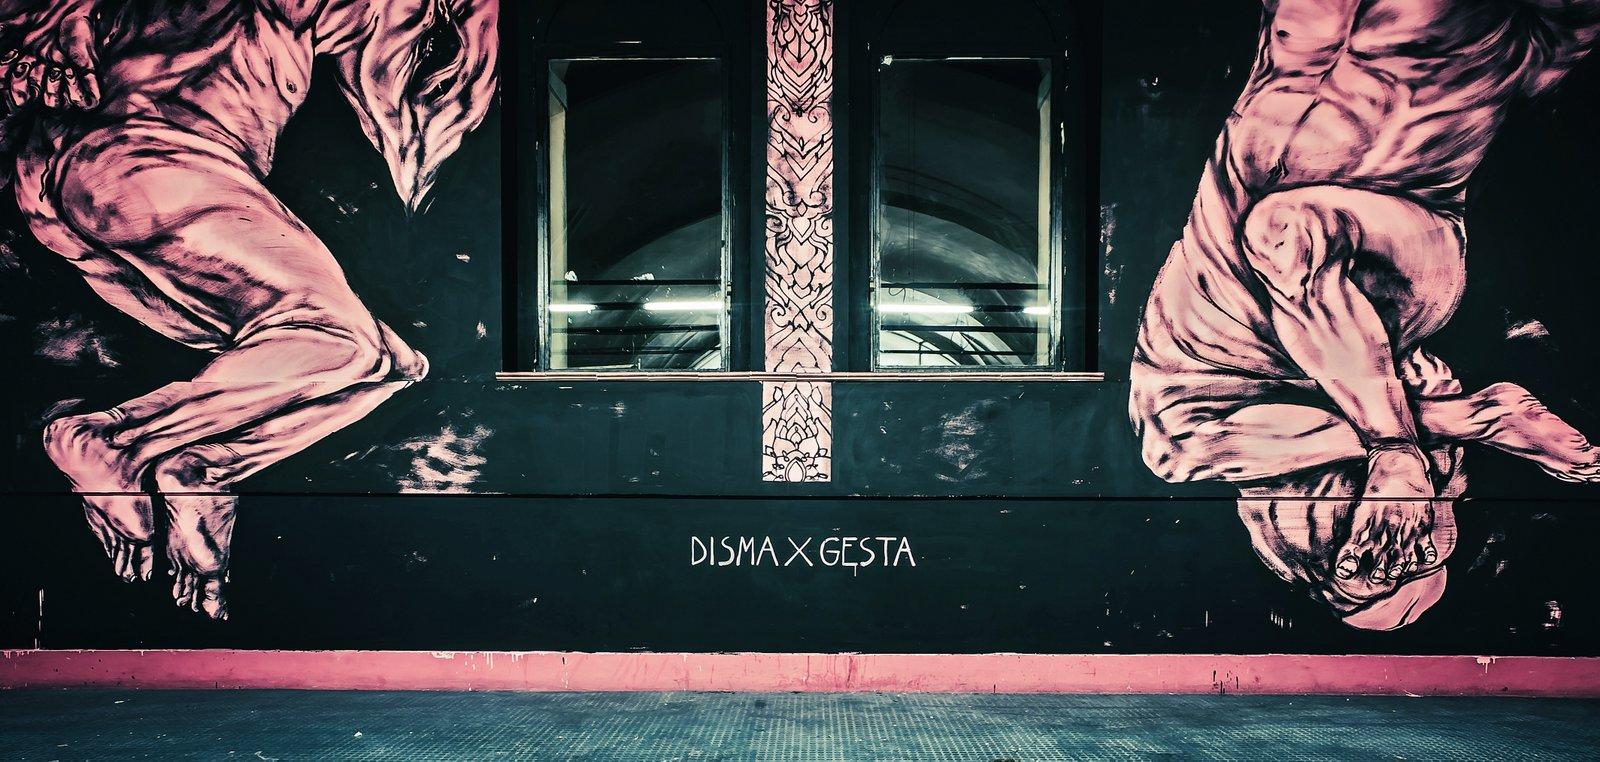 james-kalinda-disma-e-gesta-new-mural-in-parma-02